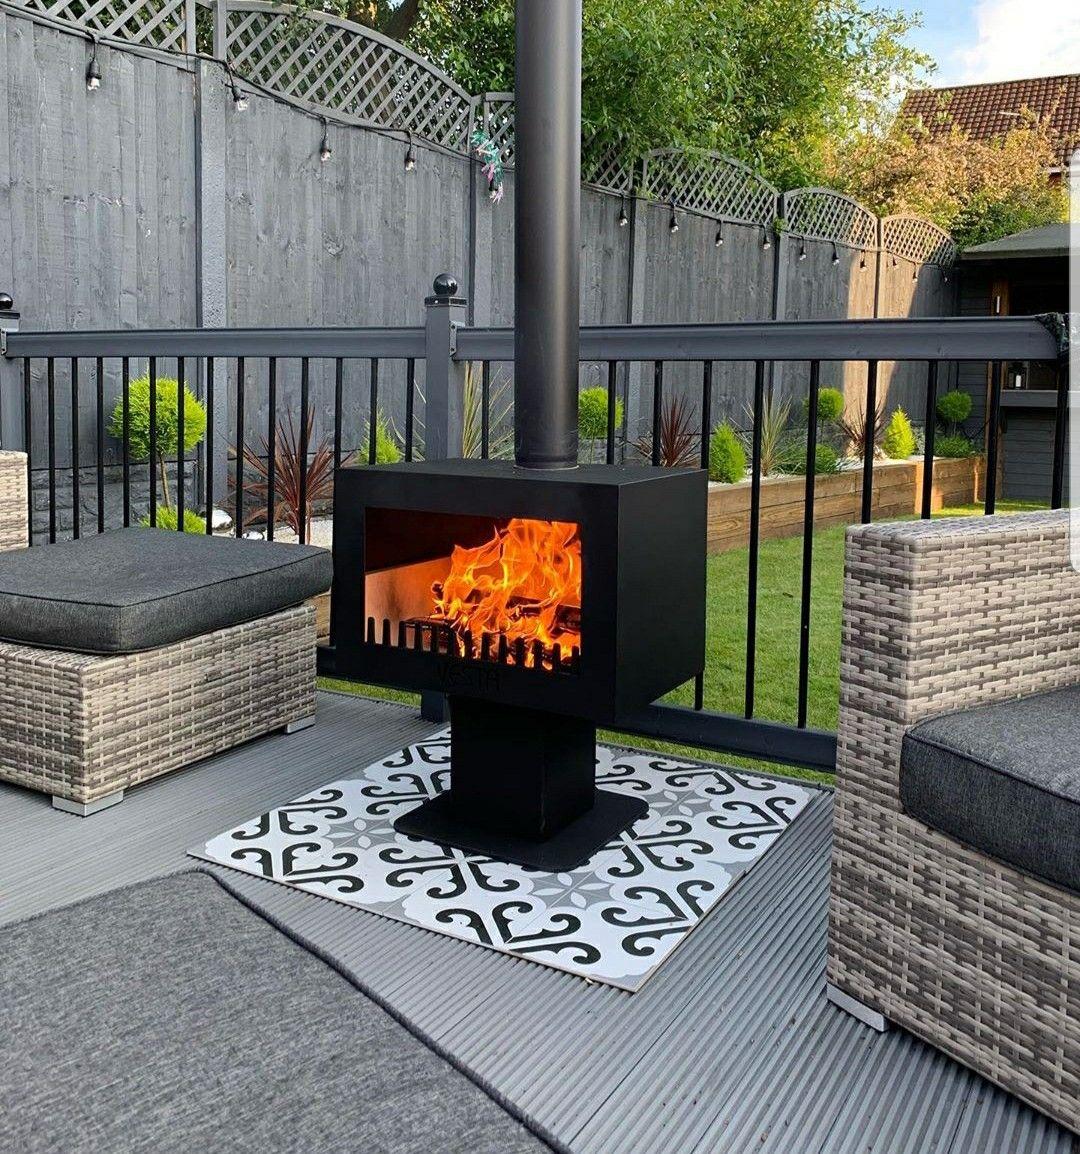 Fiesta Garden Stove And Chimnea Garden Wood Burner In 2020 Garden Wood Burner Wood Burner Chimnea